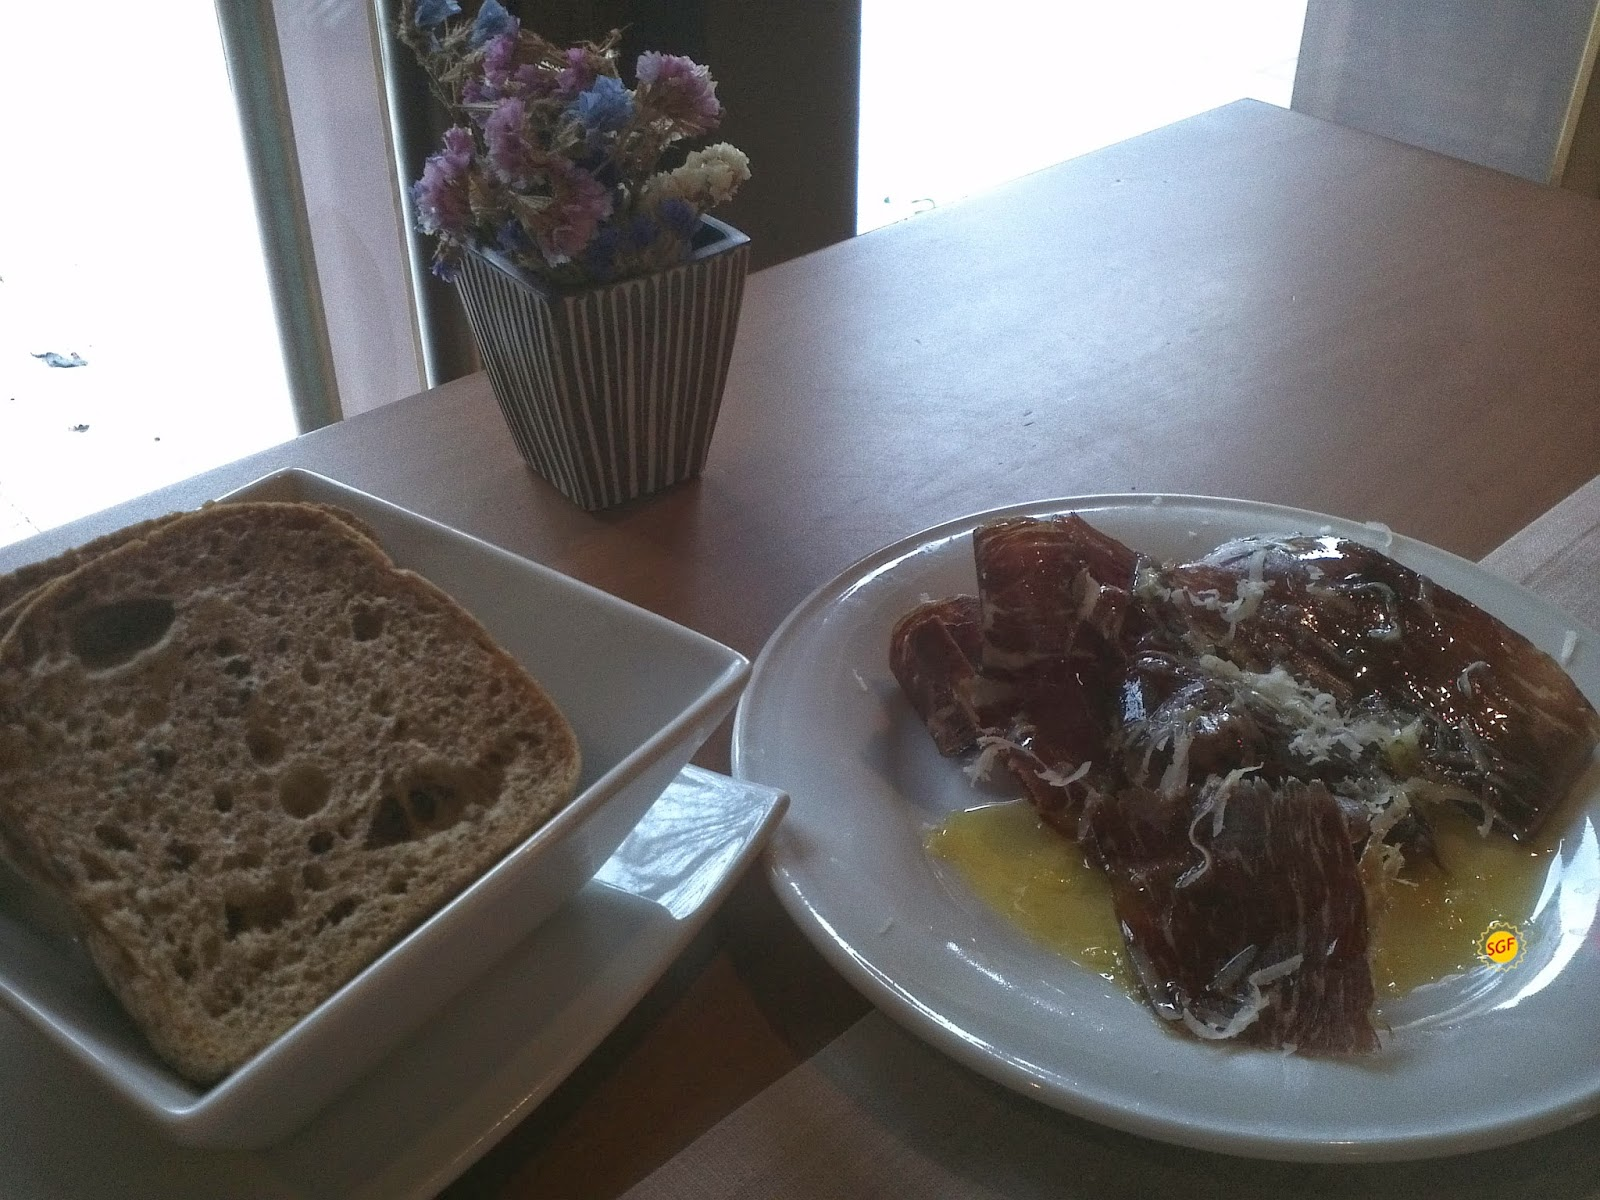 Starter and gluten-free bread